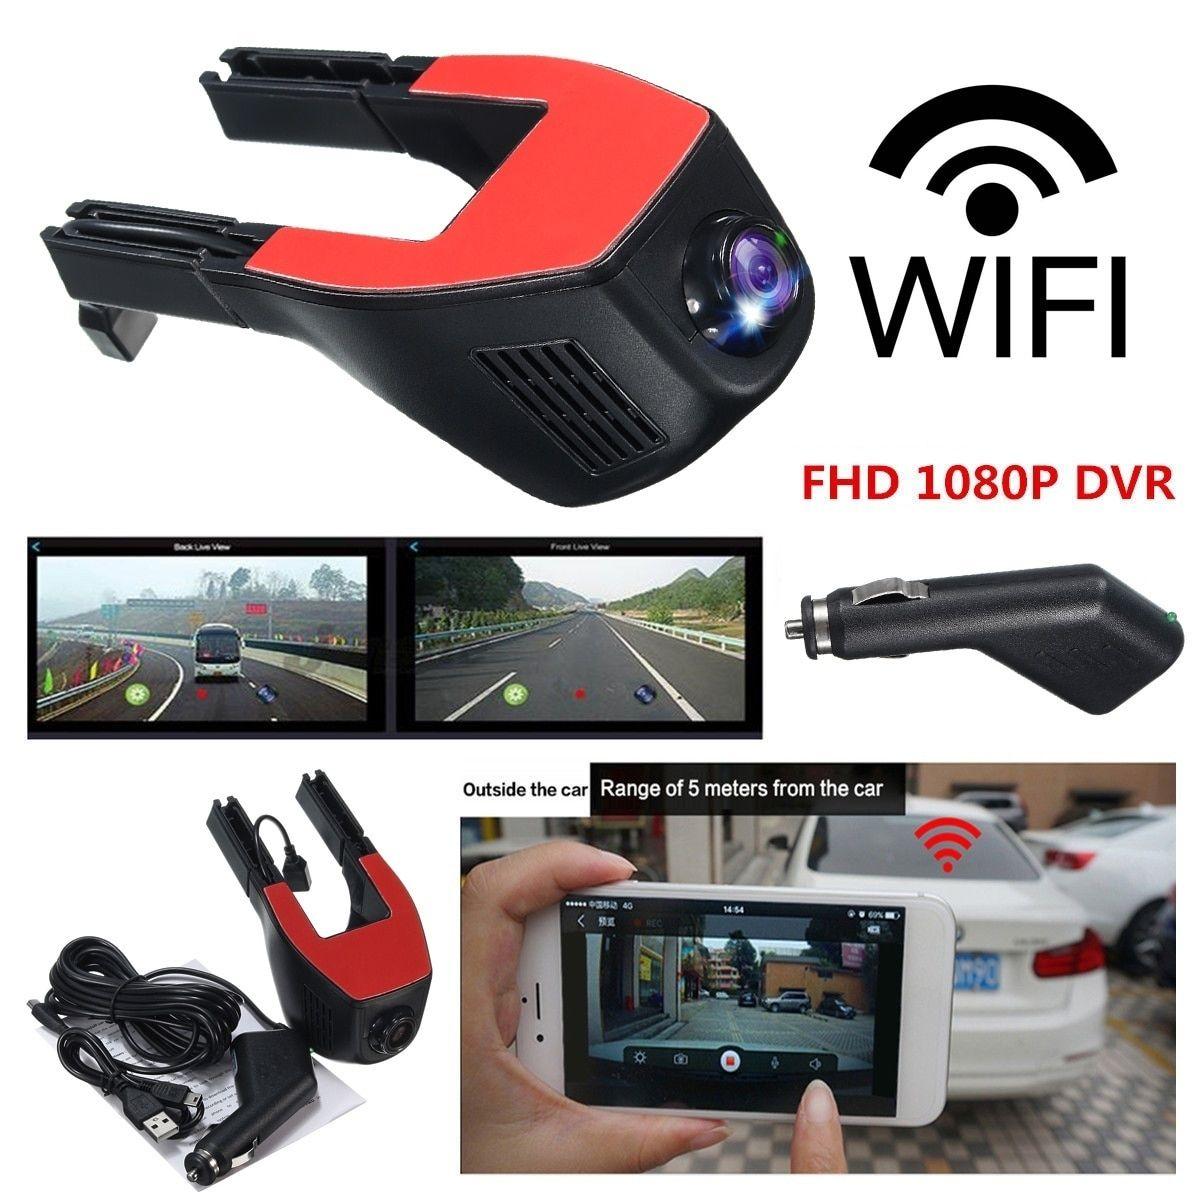 Winksoar 1080P WiFi 170° Hidden Car DVR Dash Camera Video